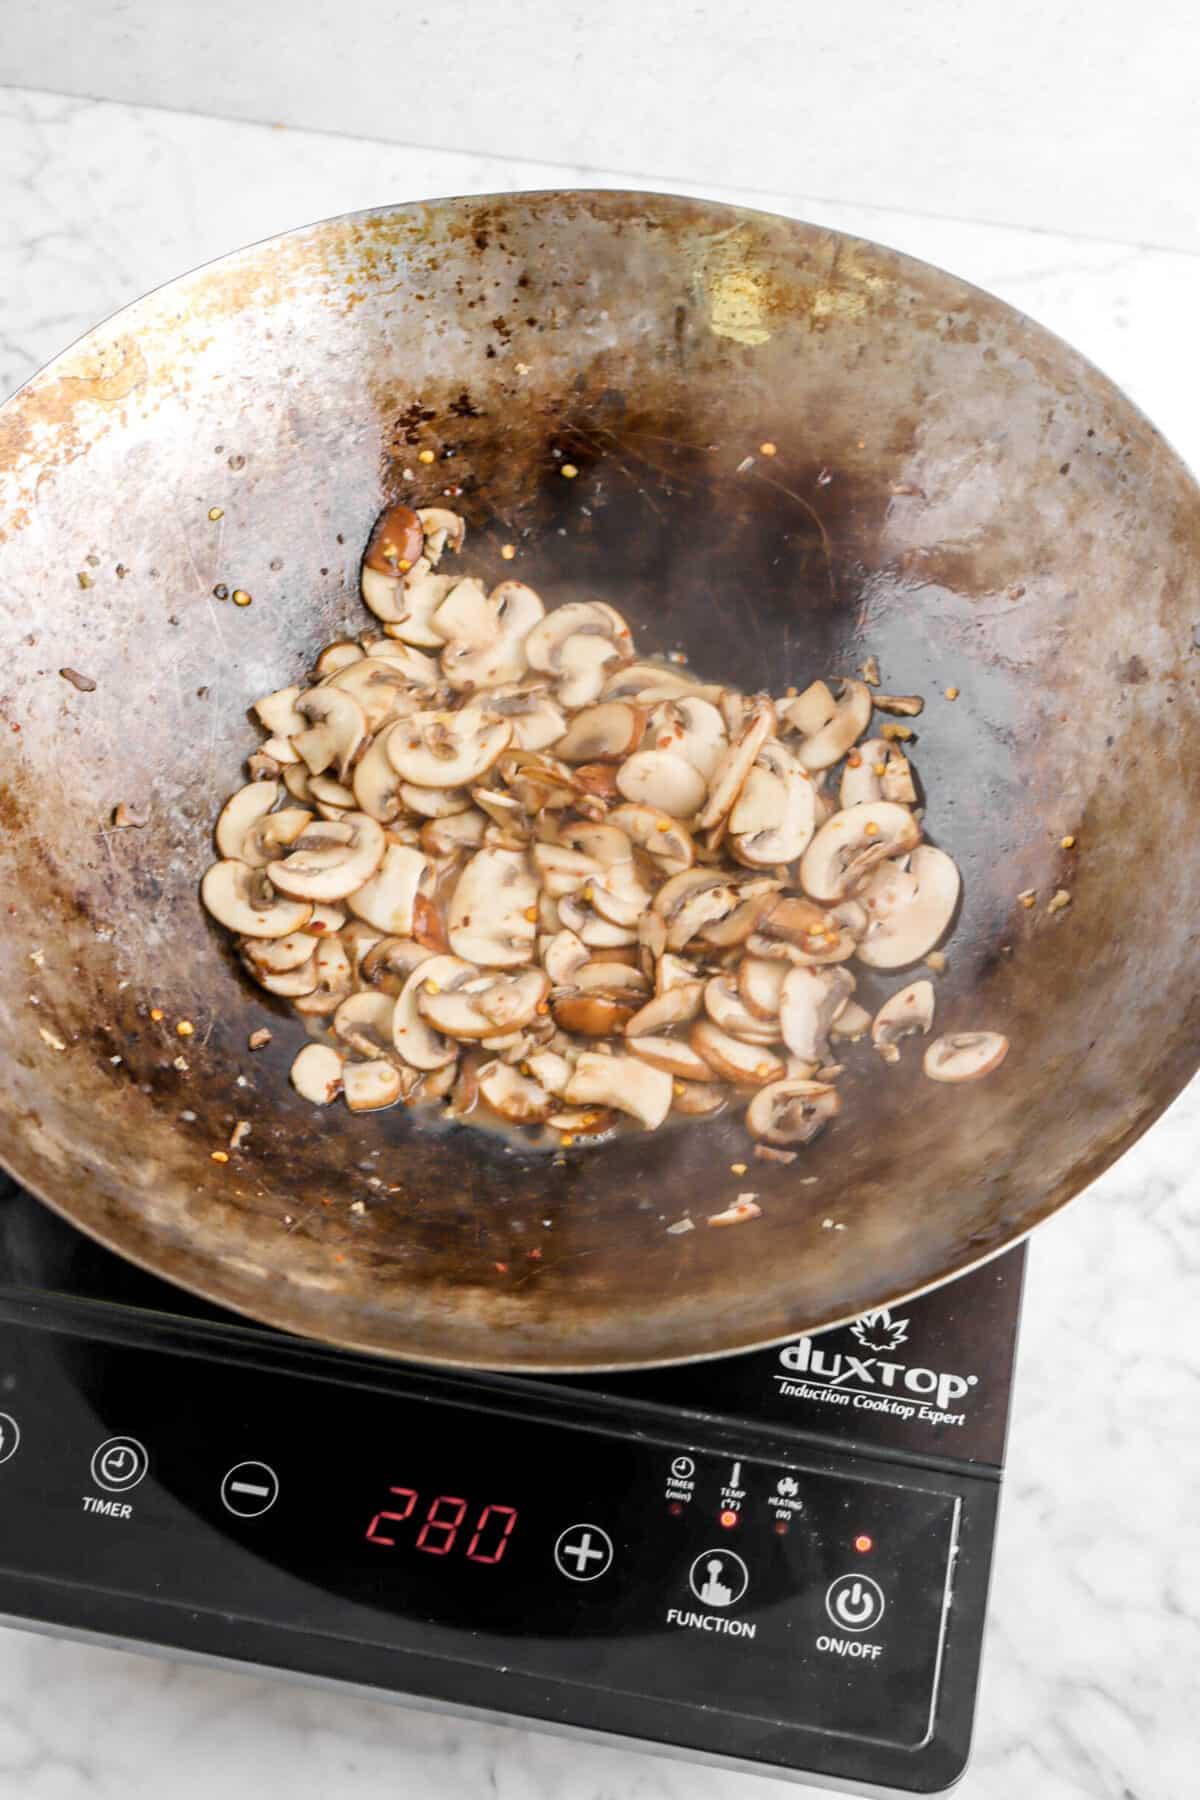 Sautéed mushrooms in a wok